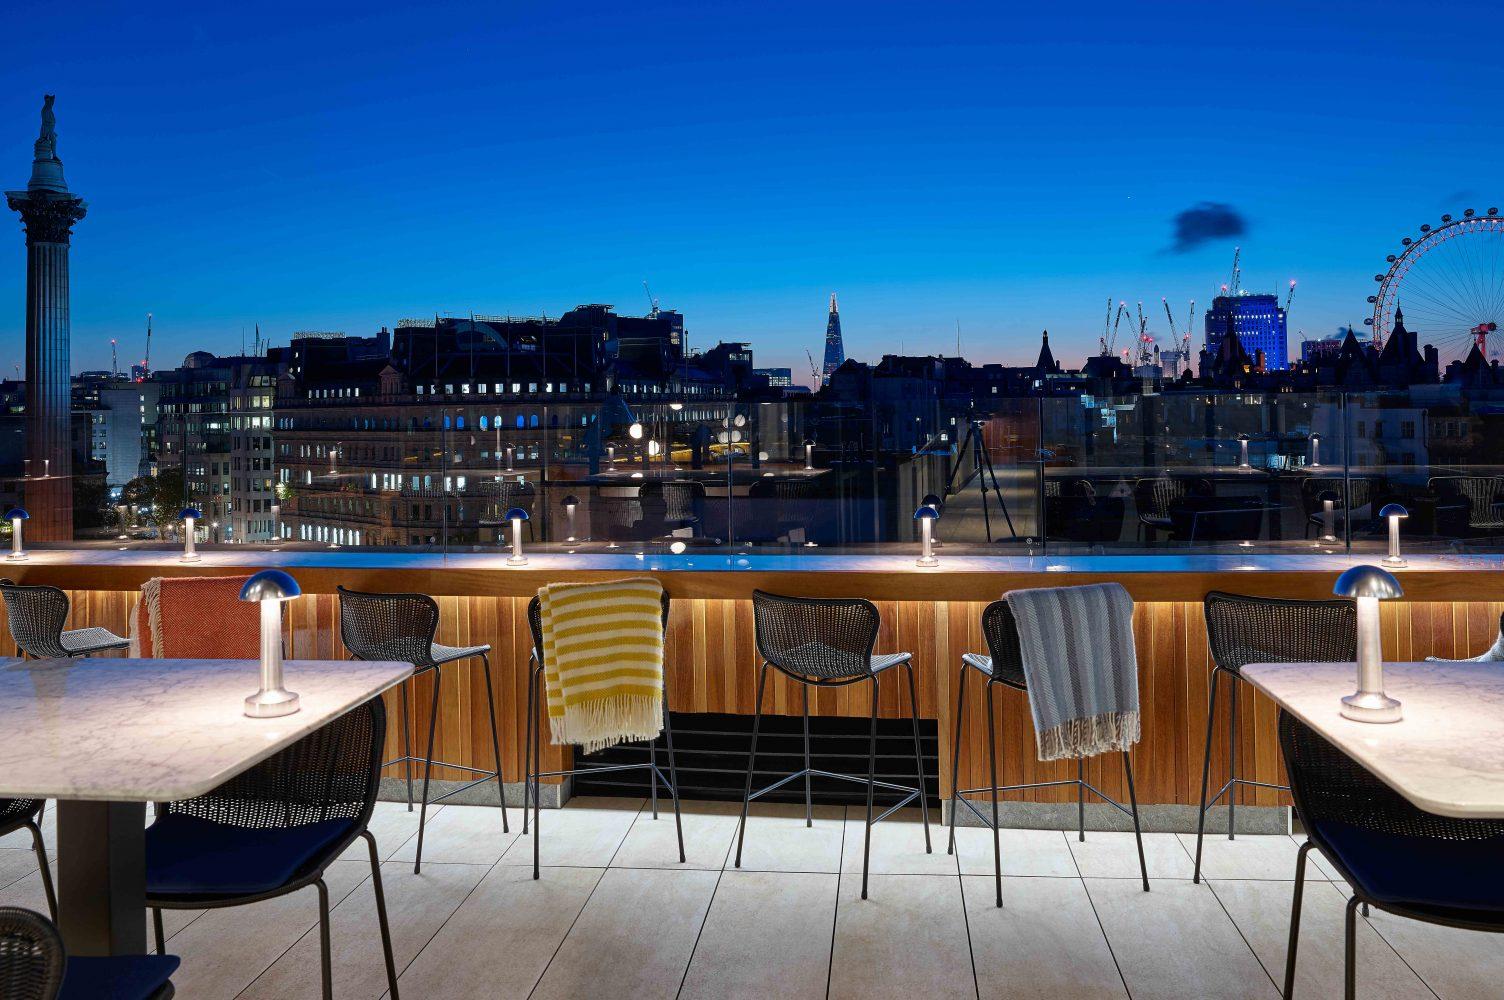 St james - best roof bars london